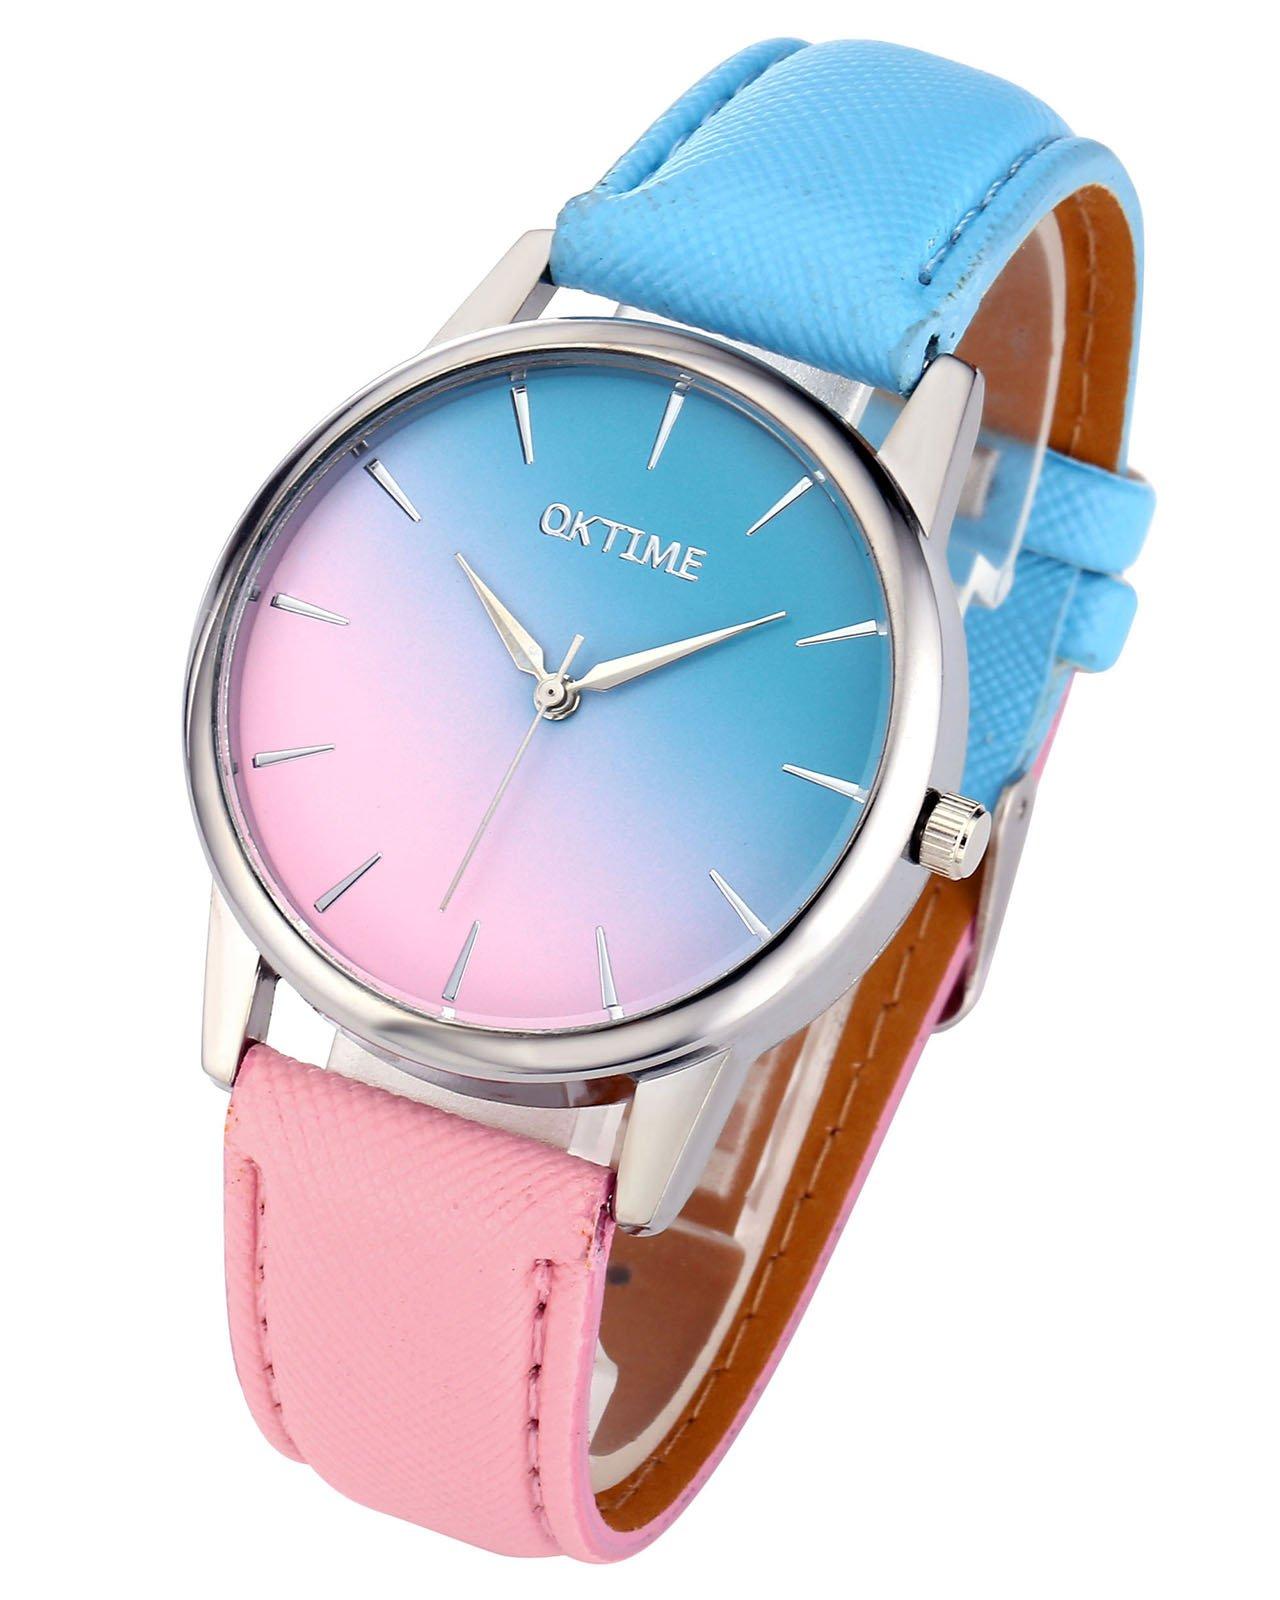 JSDDE 2x Fashion Cute Candy Farbe Damen Armbanduhr Blau-Pink Farbverlauf Quarz Uhr Freundschaft Schwestern Uhren Set